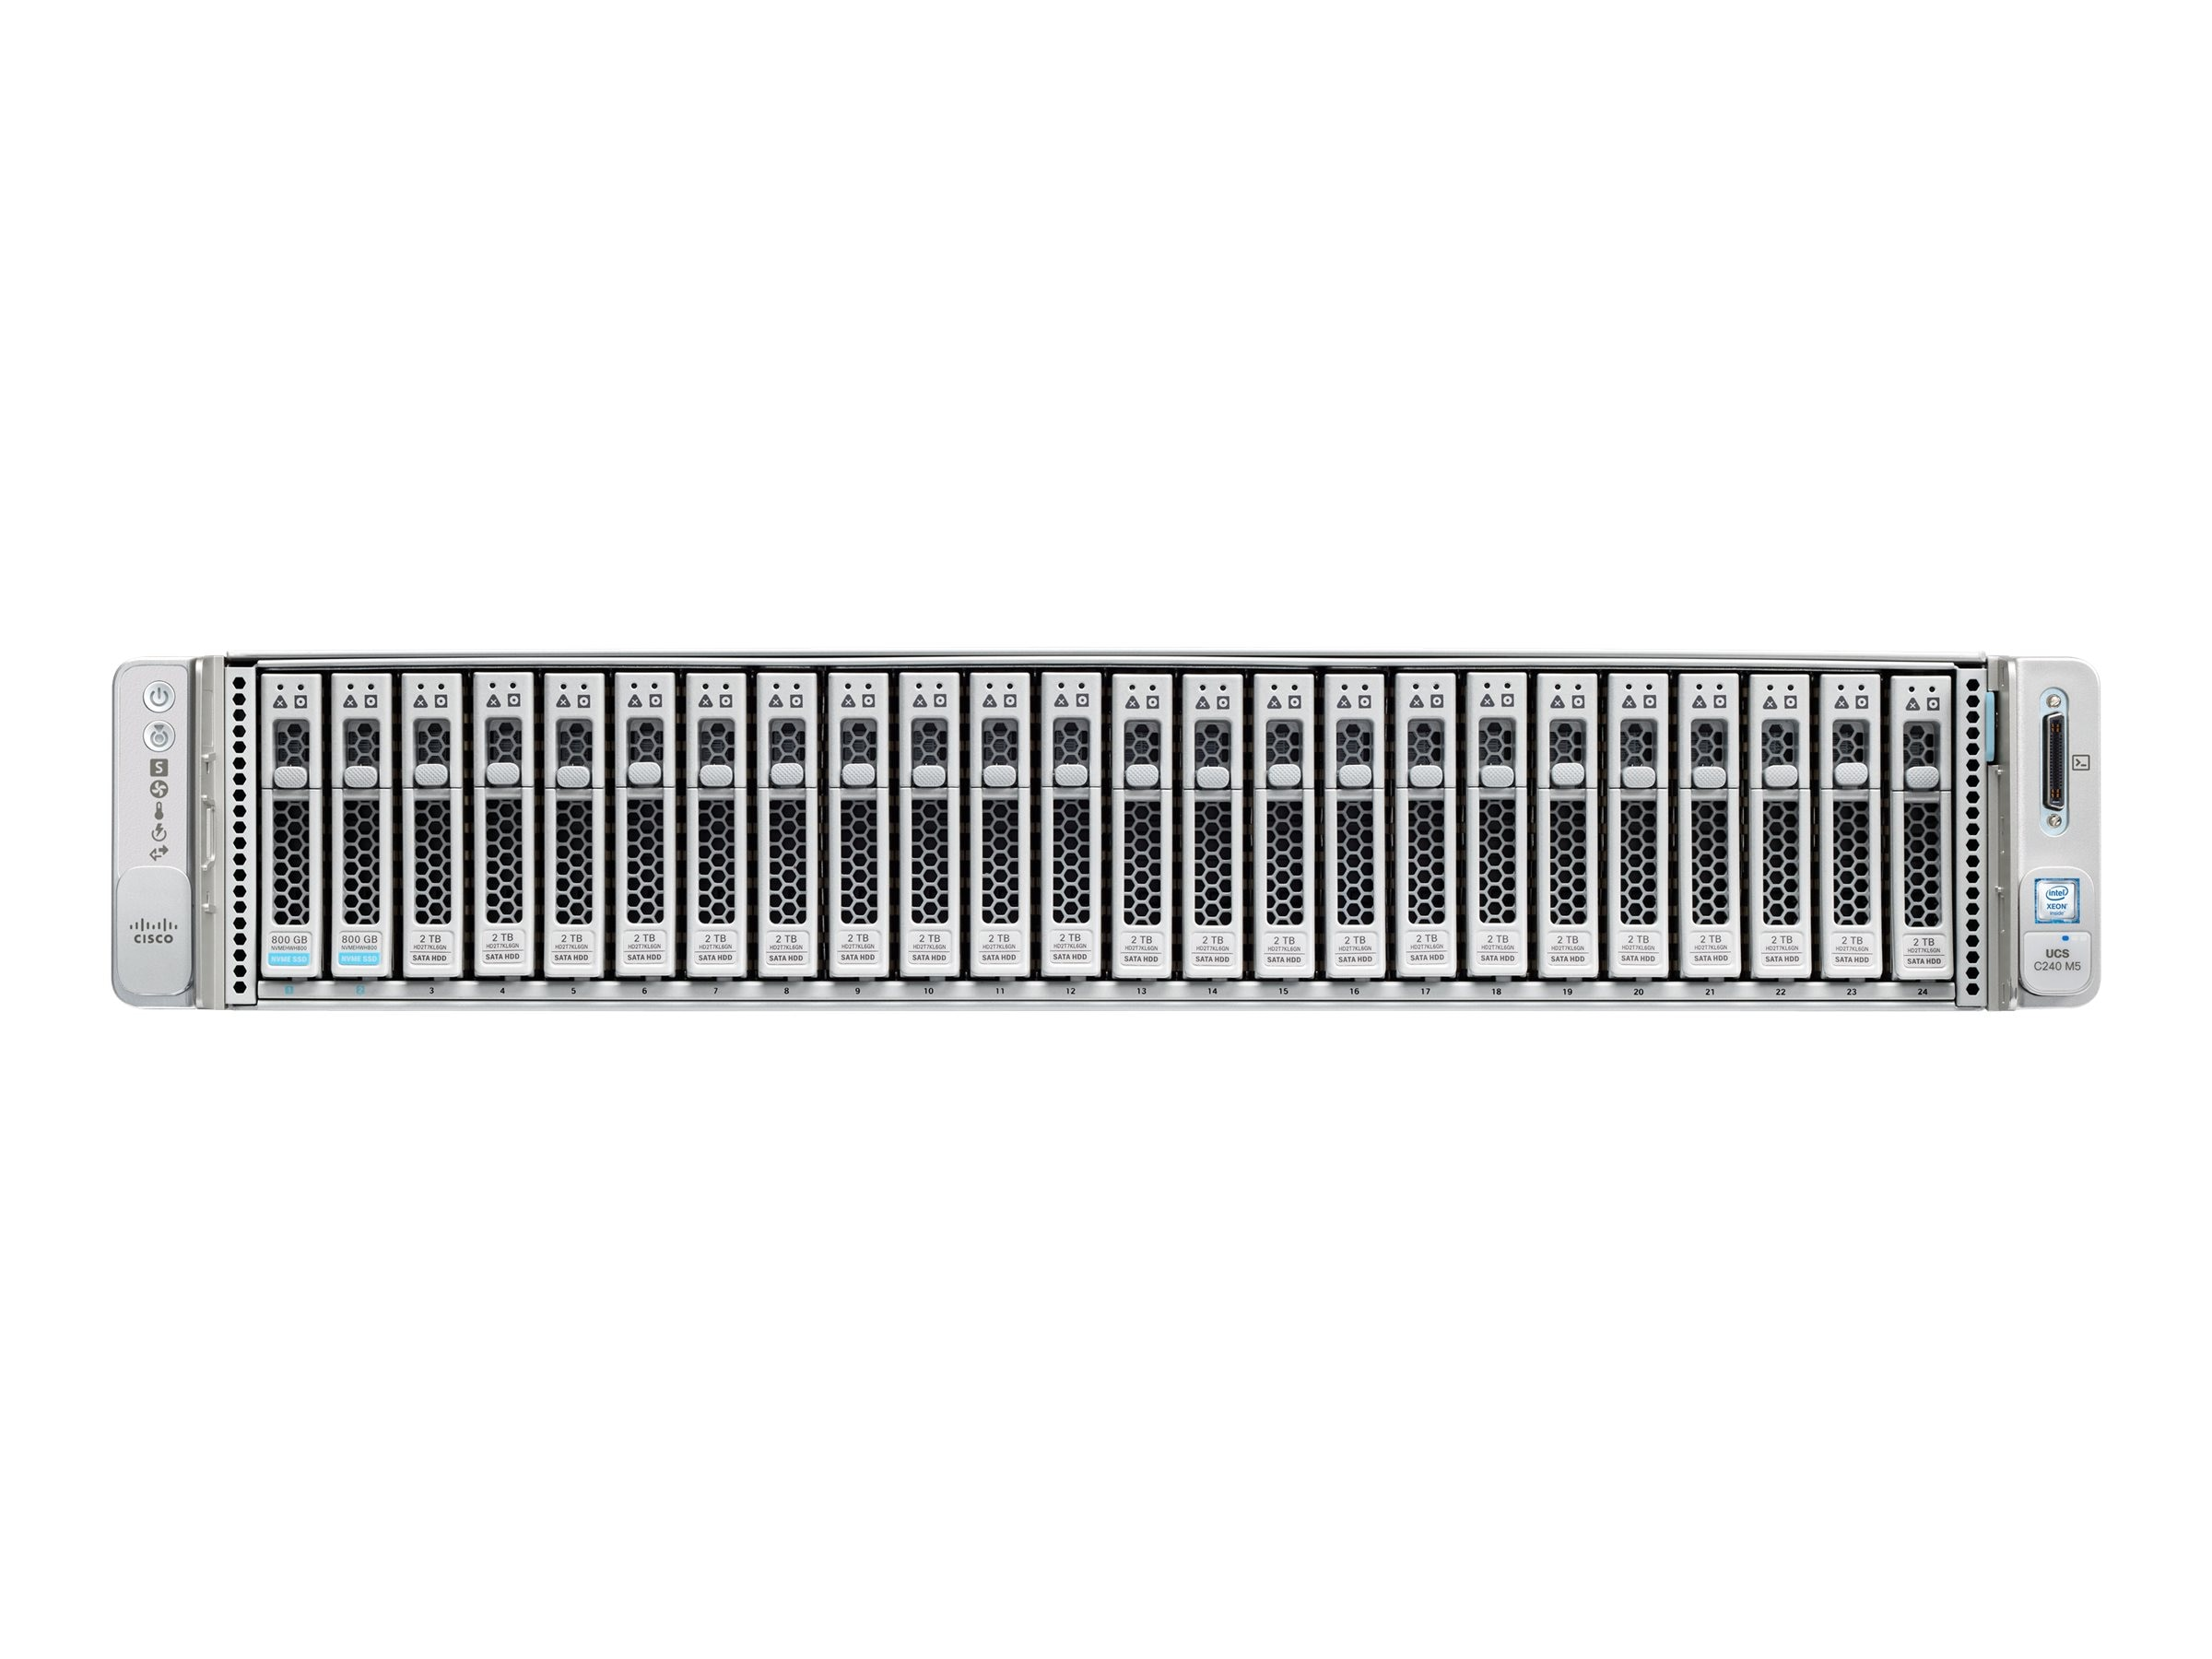 Cisco Barebones, UCS C240 M5 2U RM No CPU No RAM No HDDs 2xCPU slots  24xDIMM slots 26x2 5